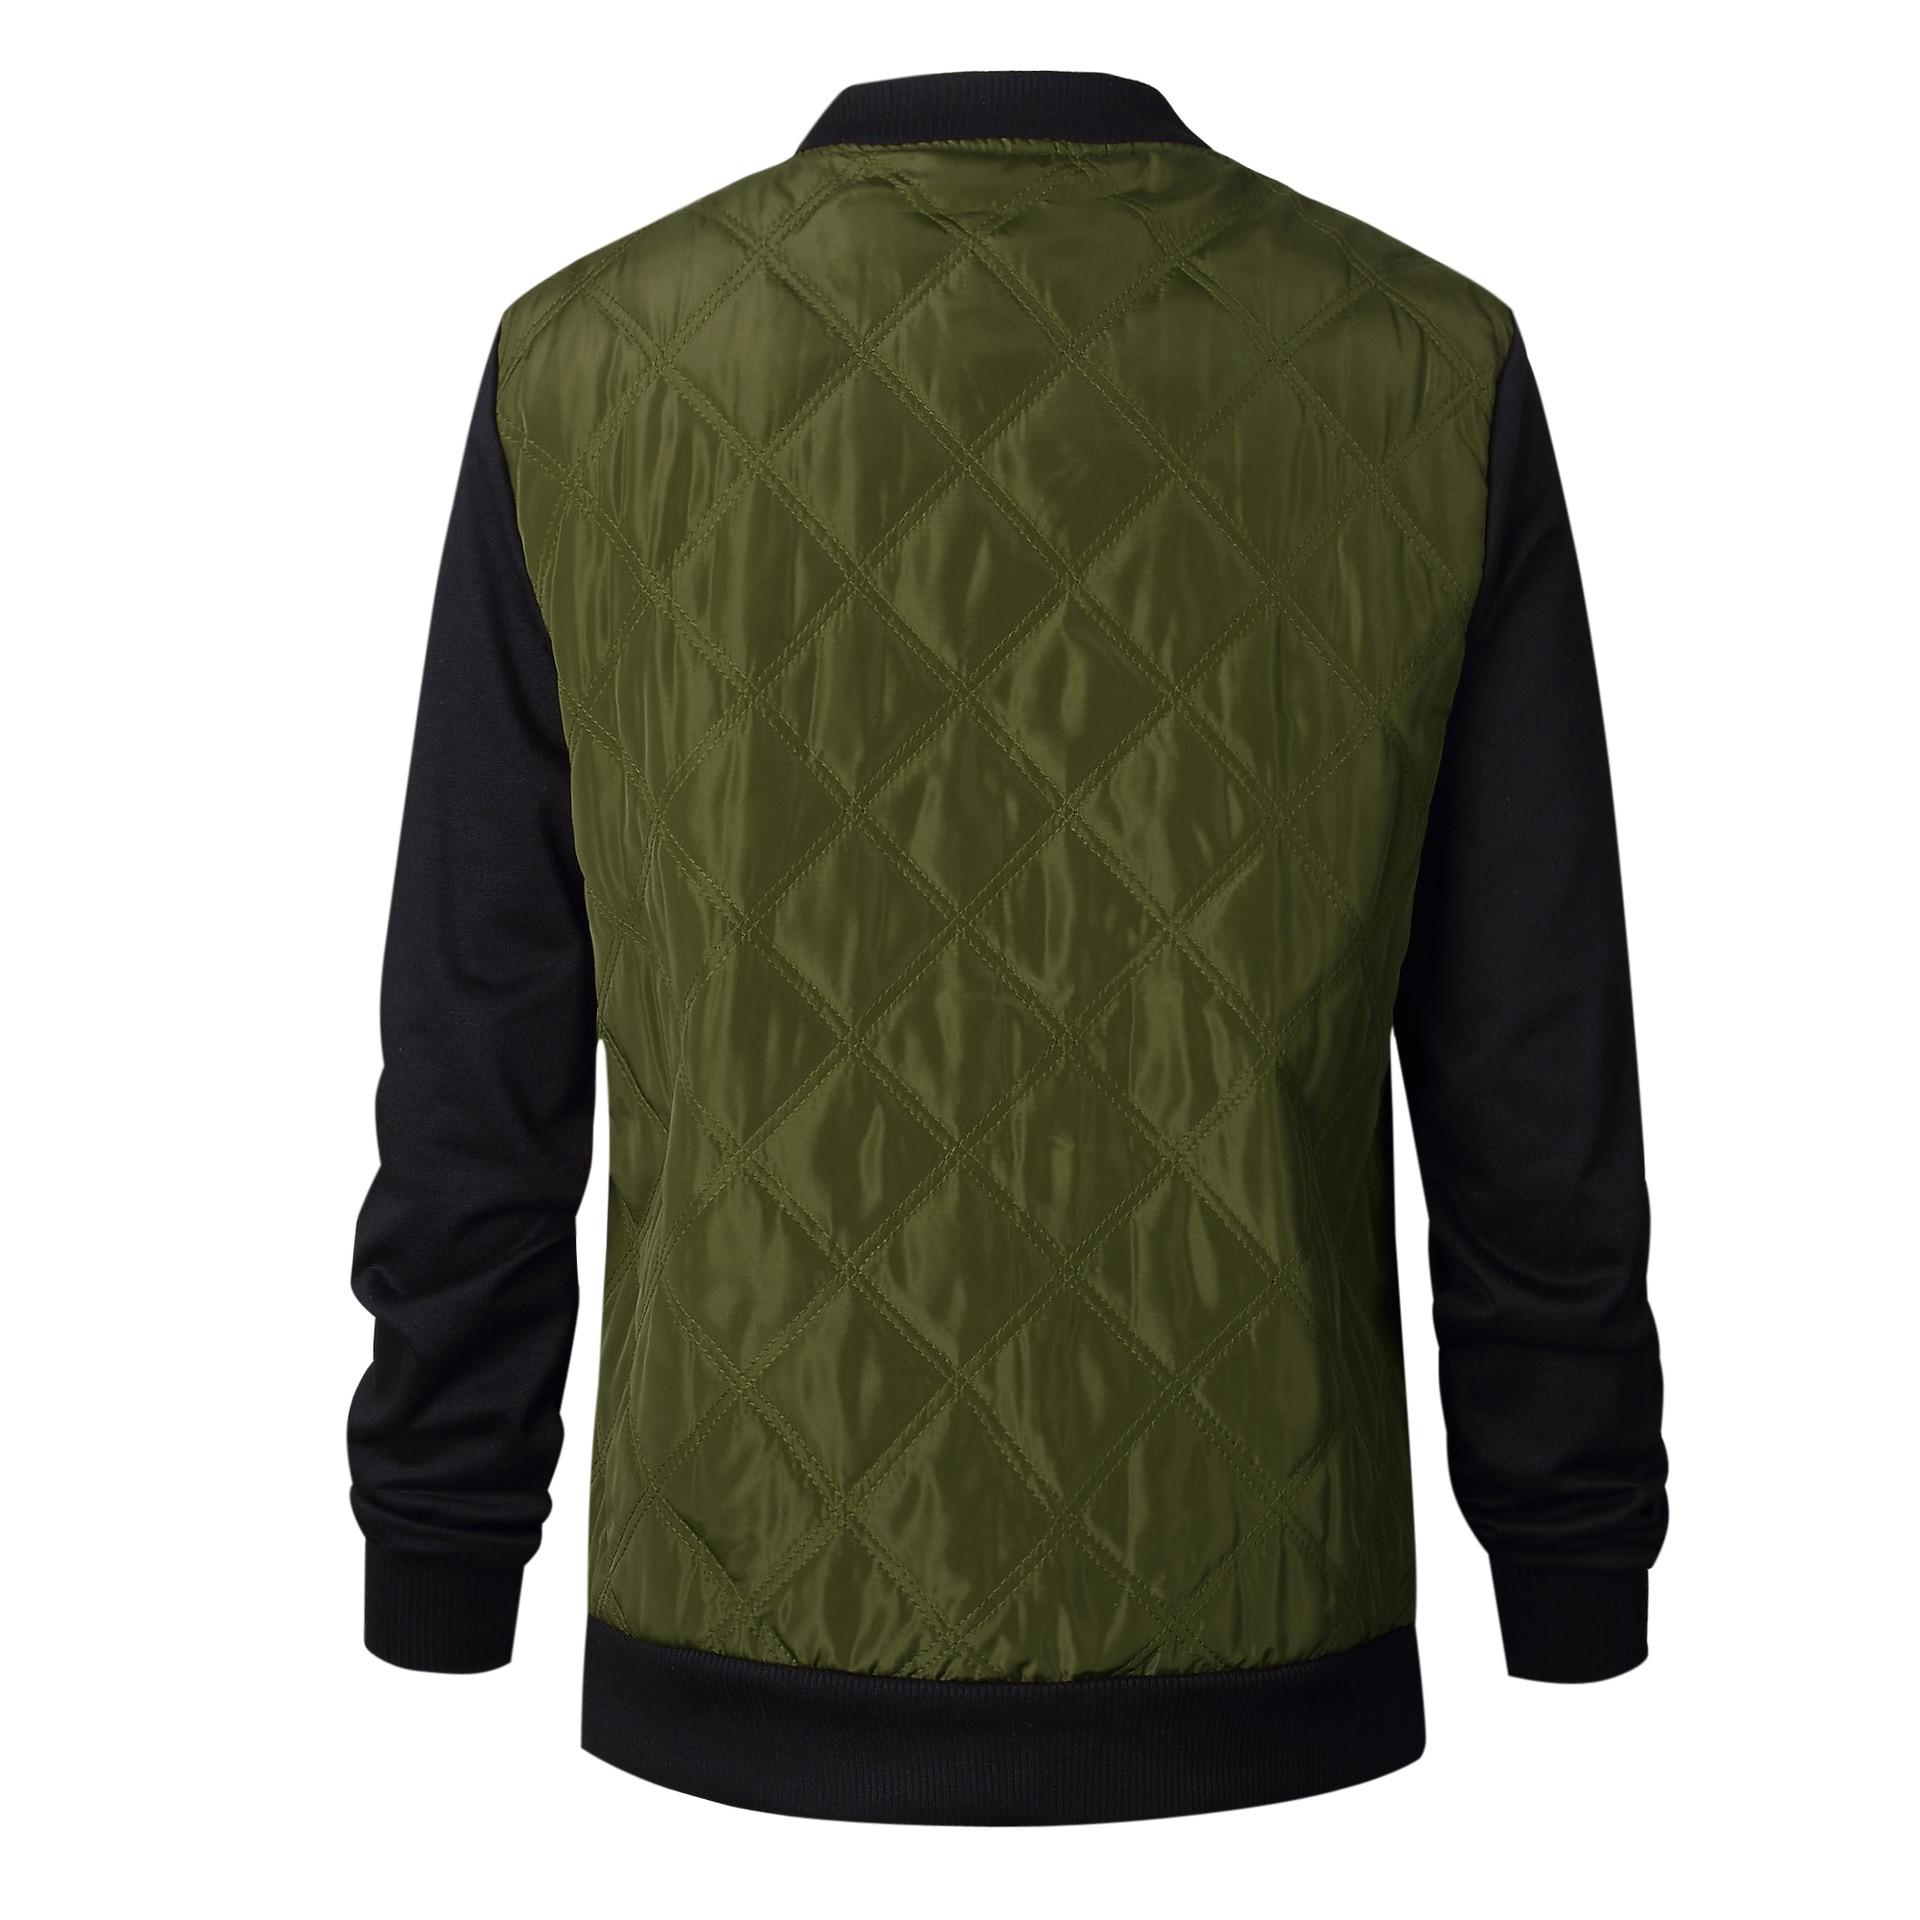 HTB1Acv7FeuSBuNjy1Xcq6AYjFXad Plus Size Autumn Winter Fashion Slim Women's Jacket Zipper Cardigan Splice Bomber Jackets 2019 Long Sleeve Bodycon Coats Female